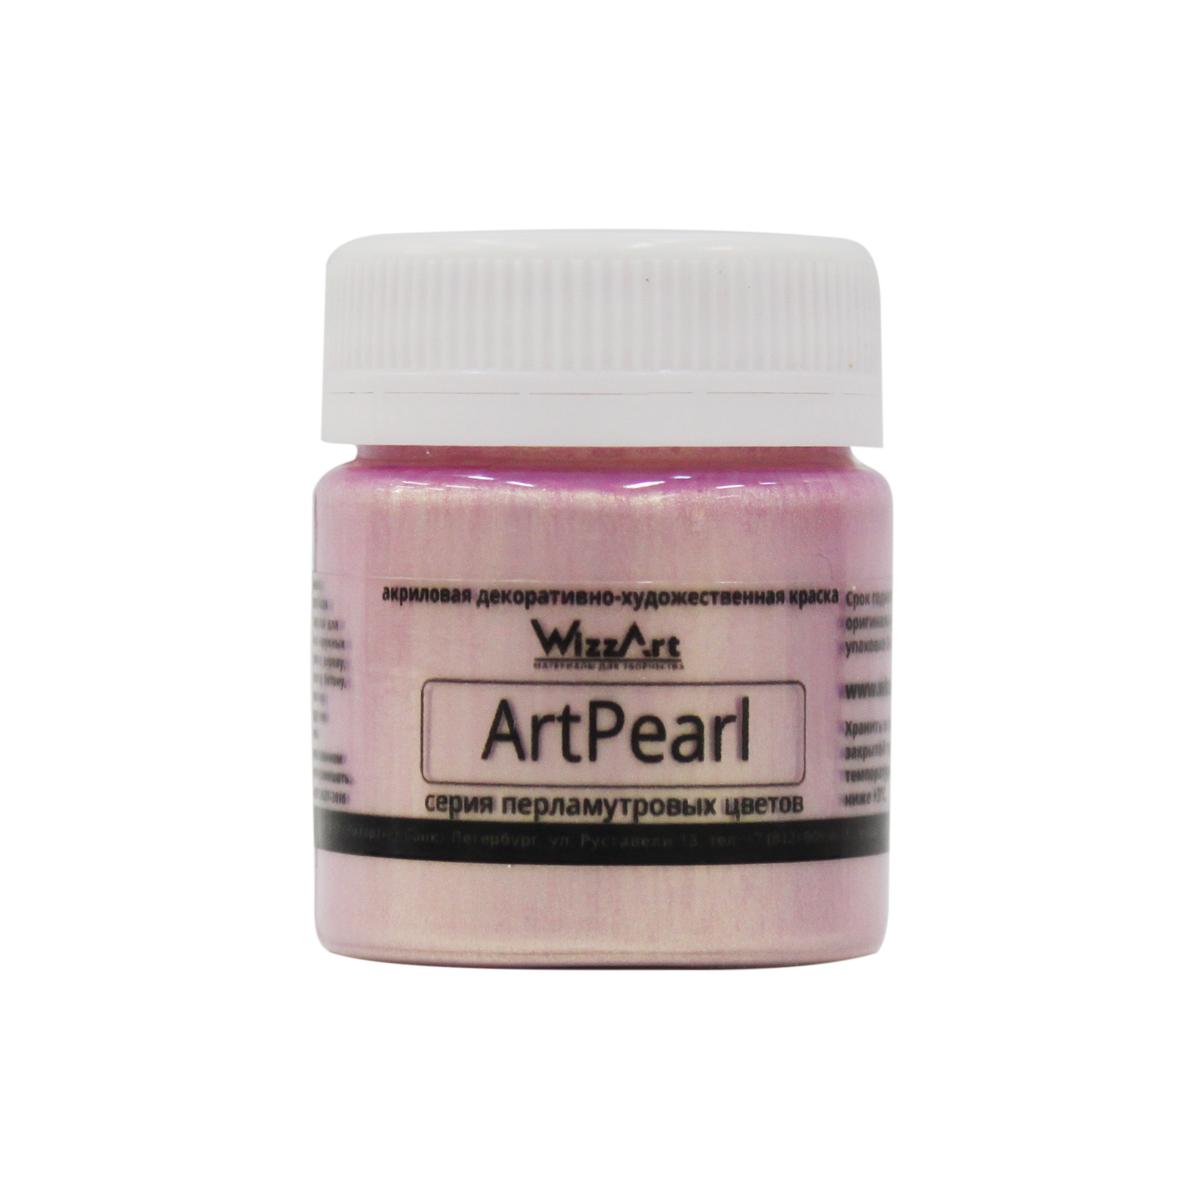 Краска акриловая Wizzart ArtPearl. Хамелеон, цвет: розовый, 40 мл501050